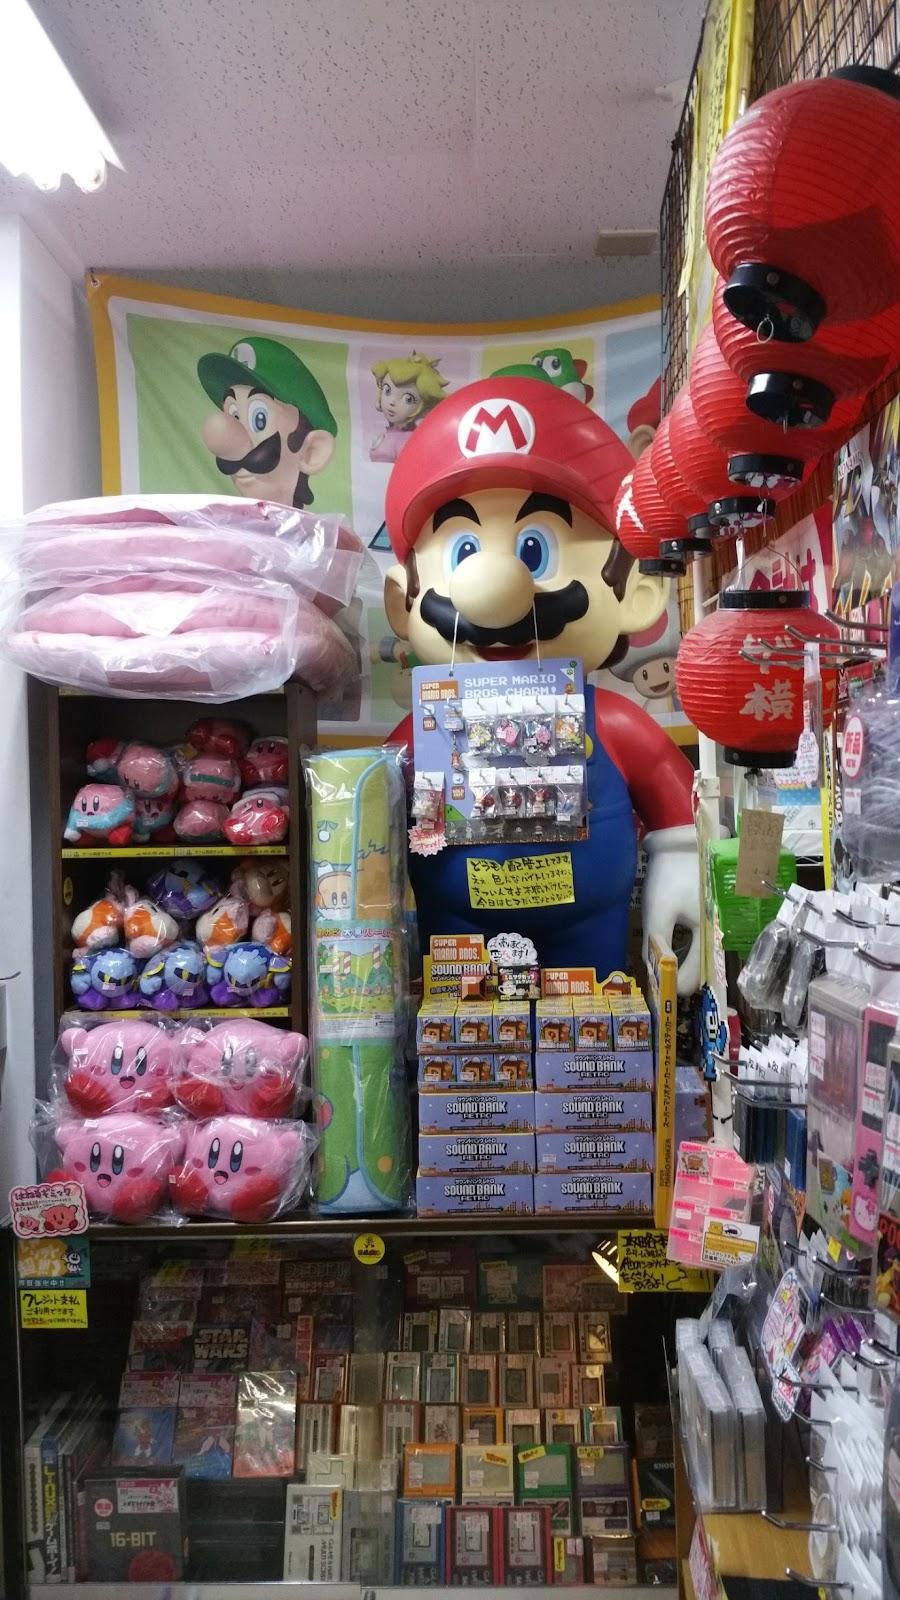 C:\Users\J\Pictures\TOKYO NOV 2016\SUPER POTATO\20161117_155750.jpg